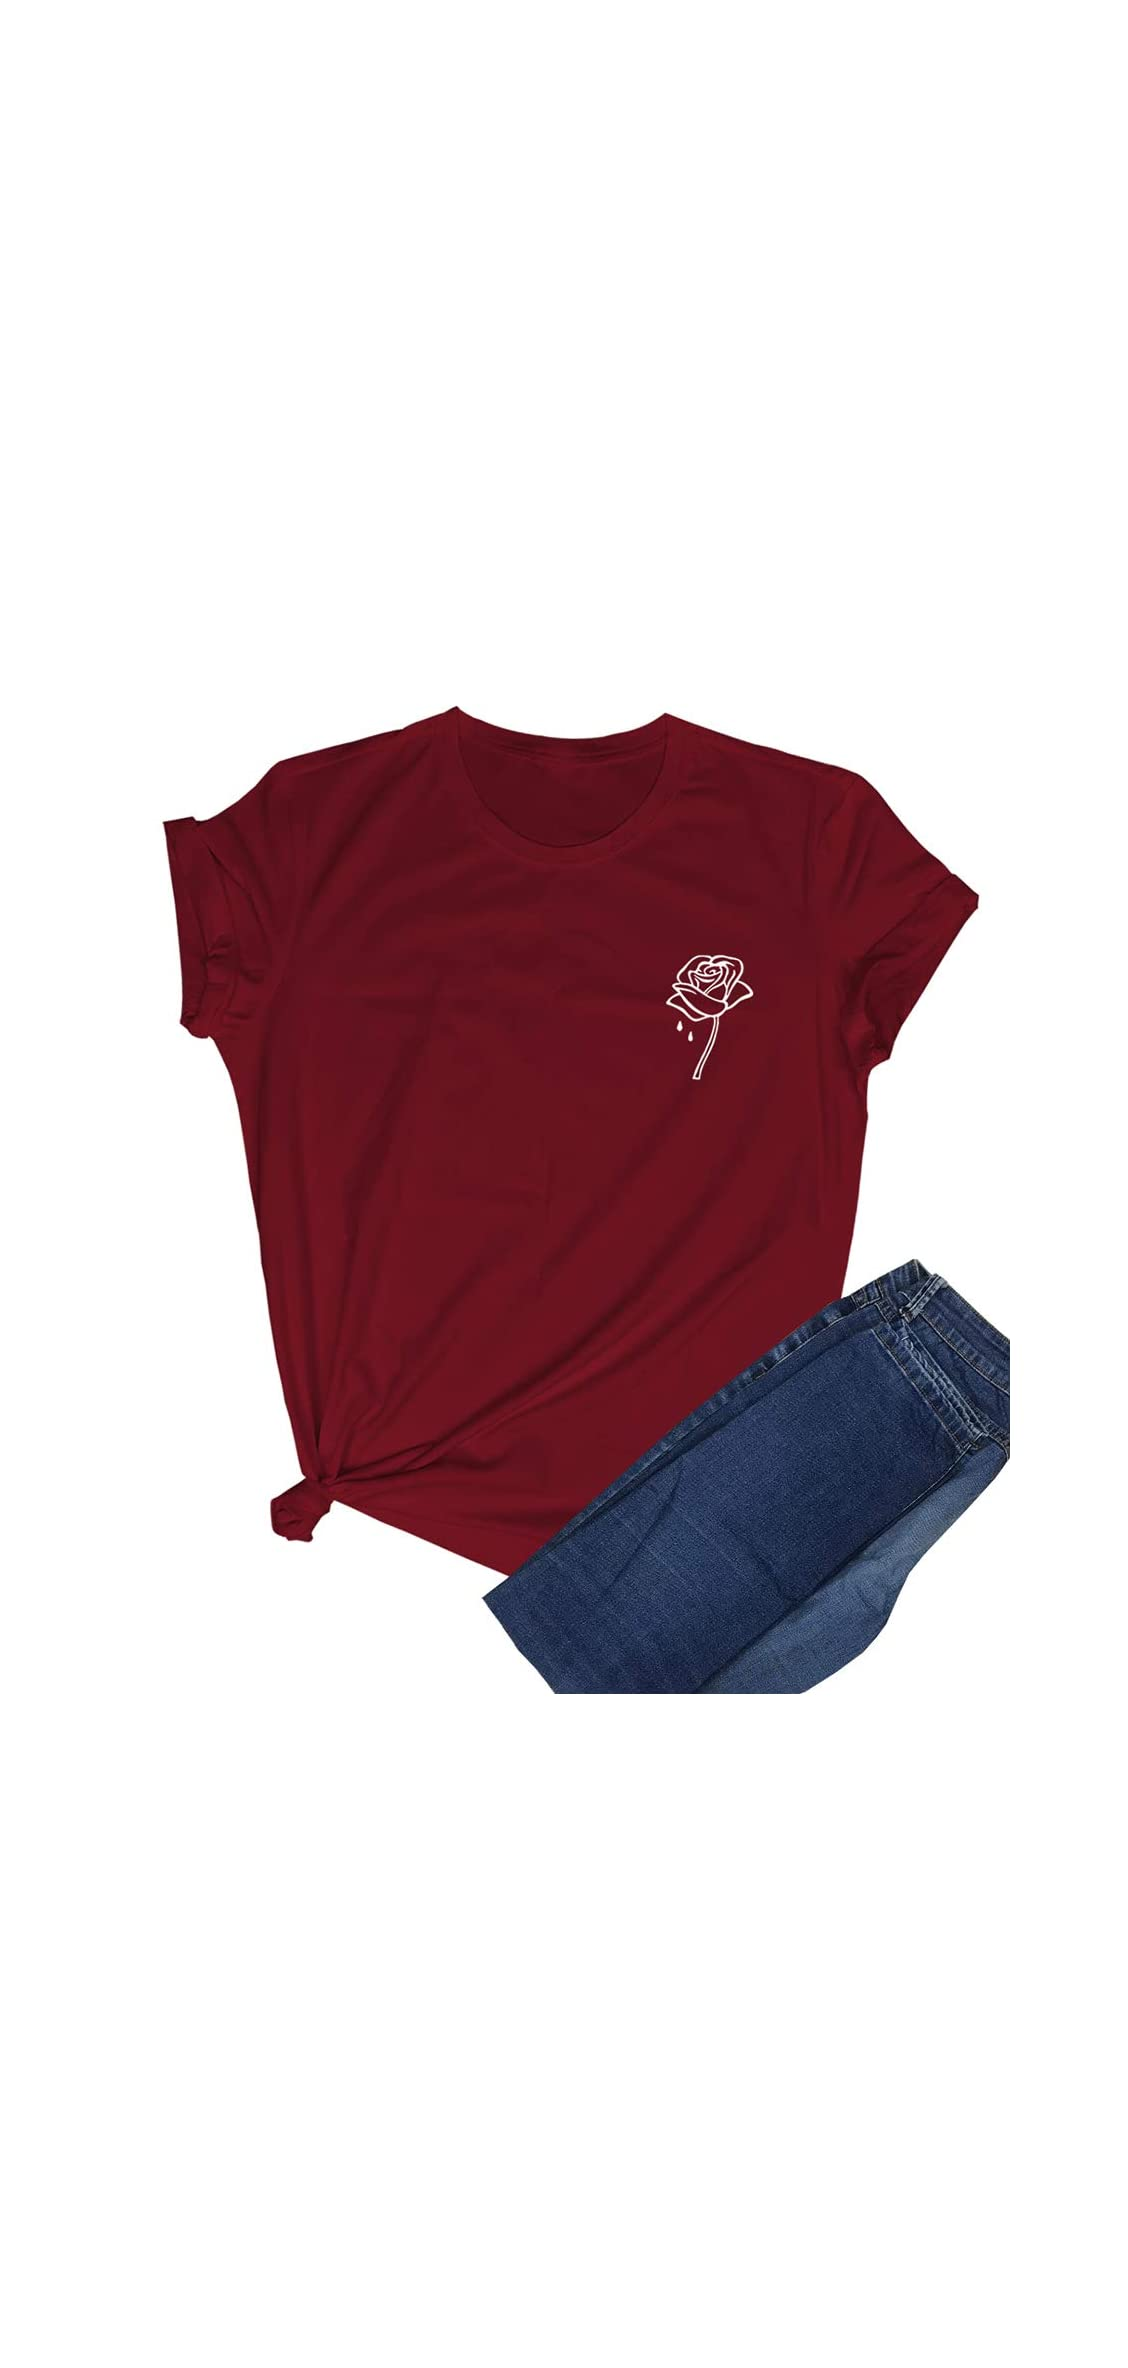 Women Cute T Shirt Juniors Graphic Tops